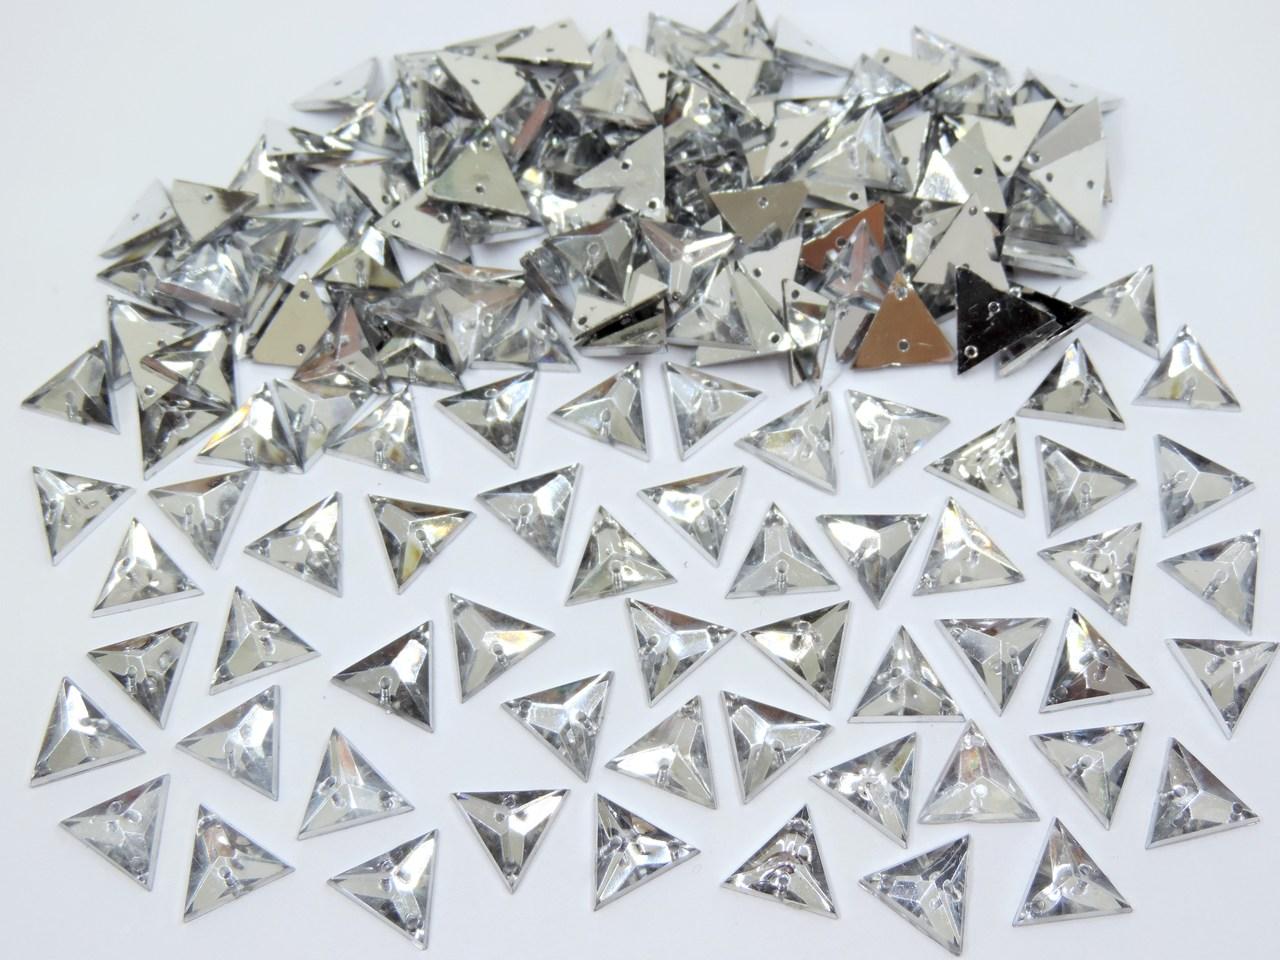 chaton triangular 14mm com furo 200 unidades